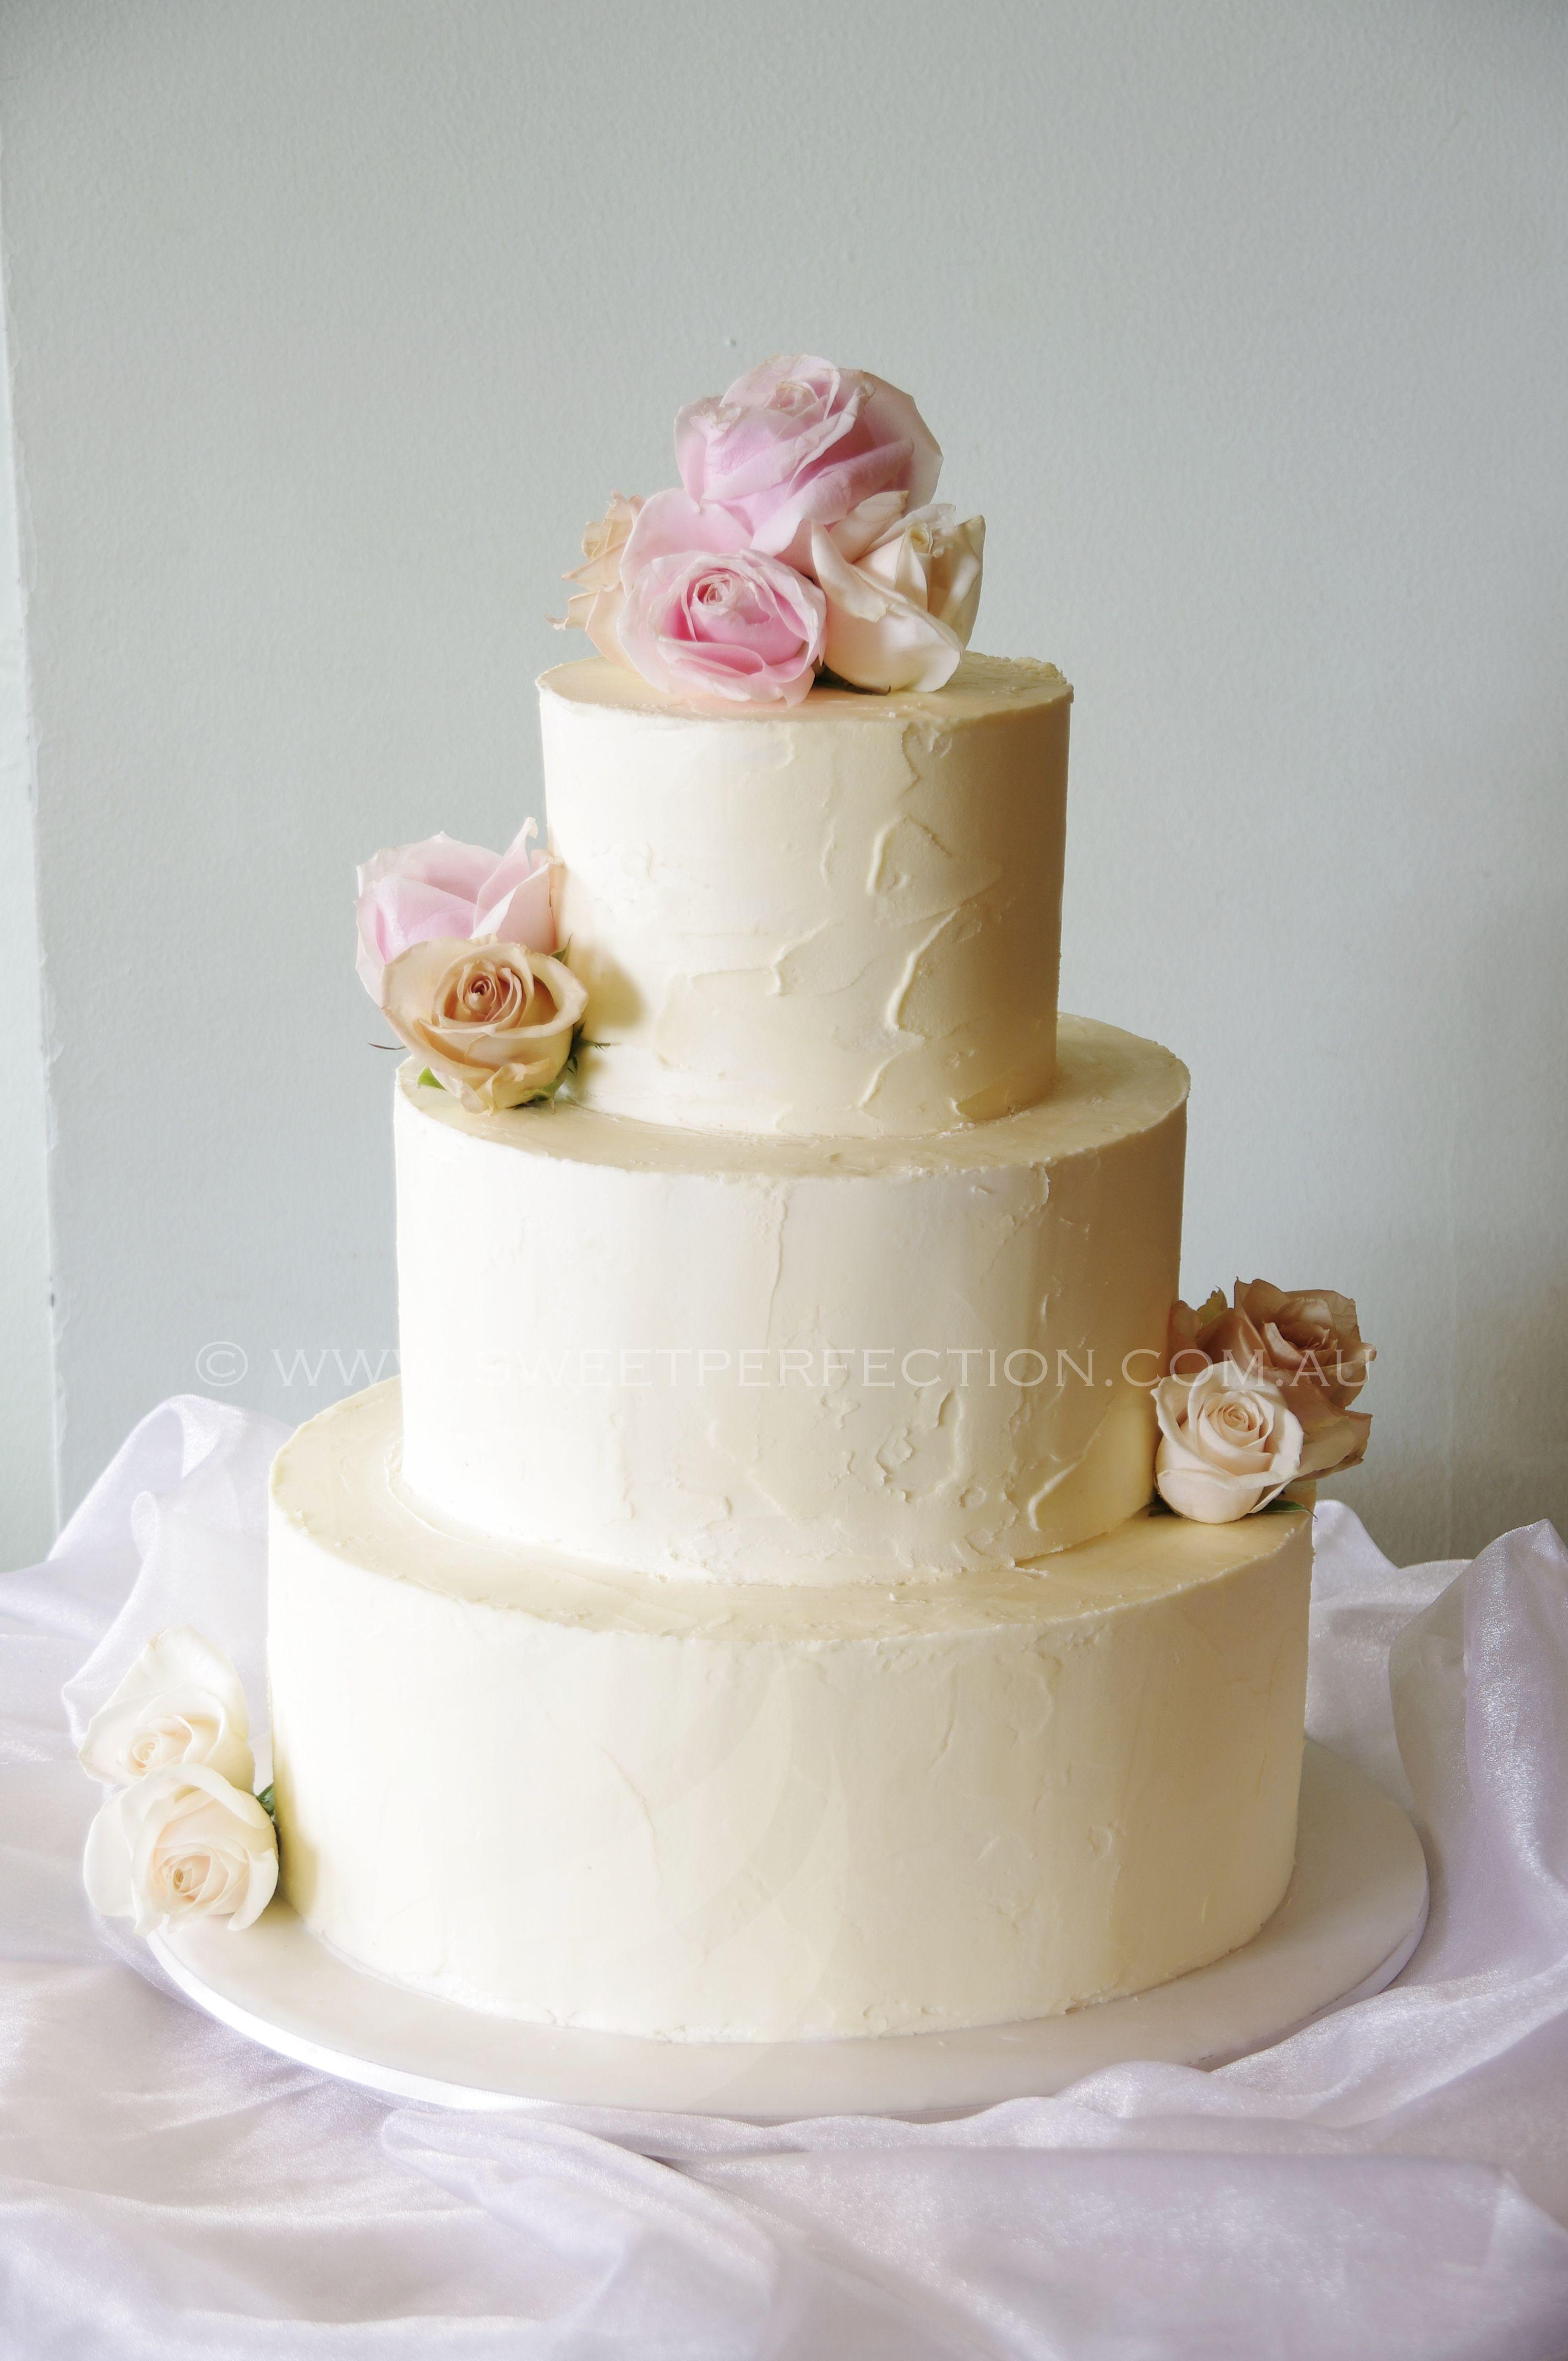 White Chocolate Italian Buttercream Wedding Cake with fresh roses ...